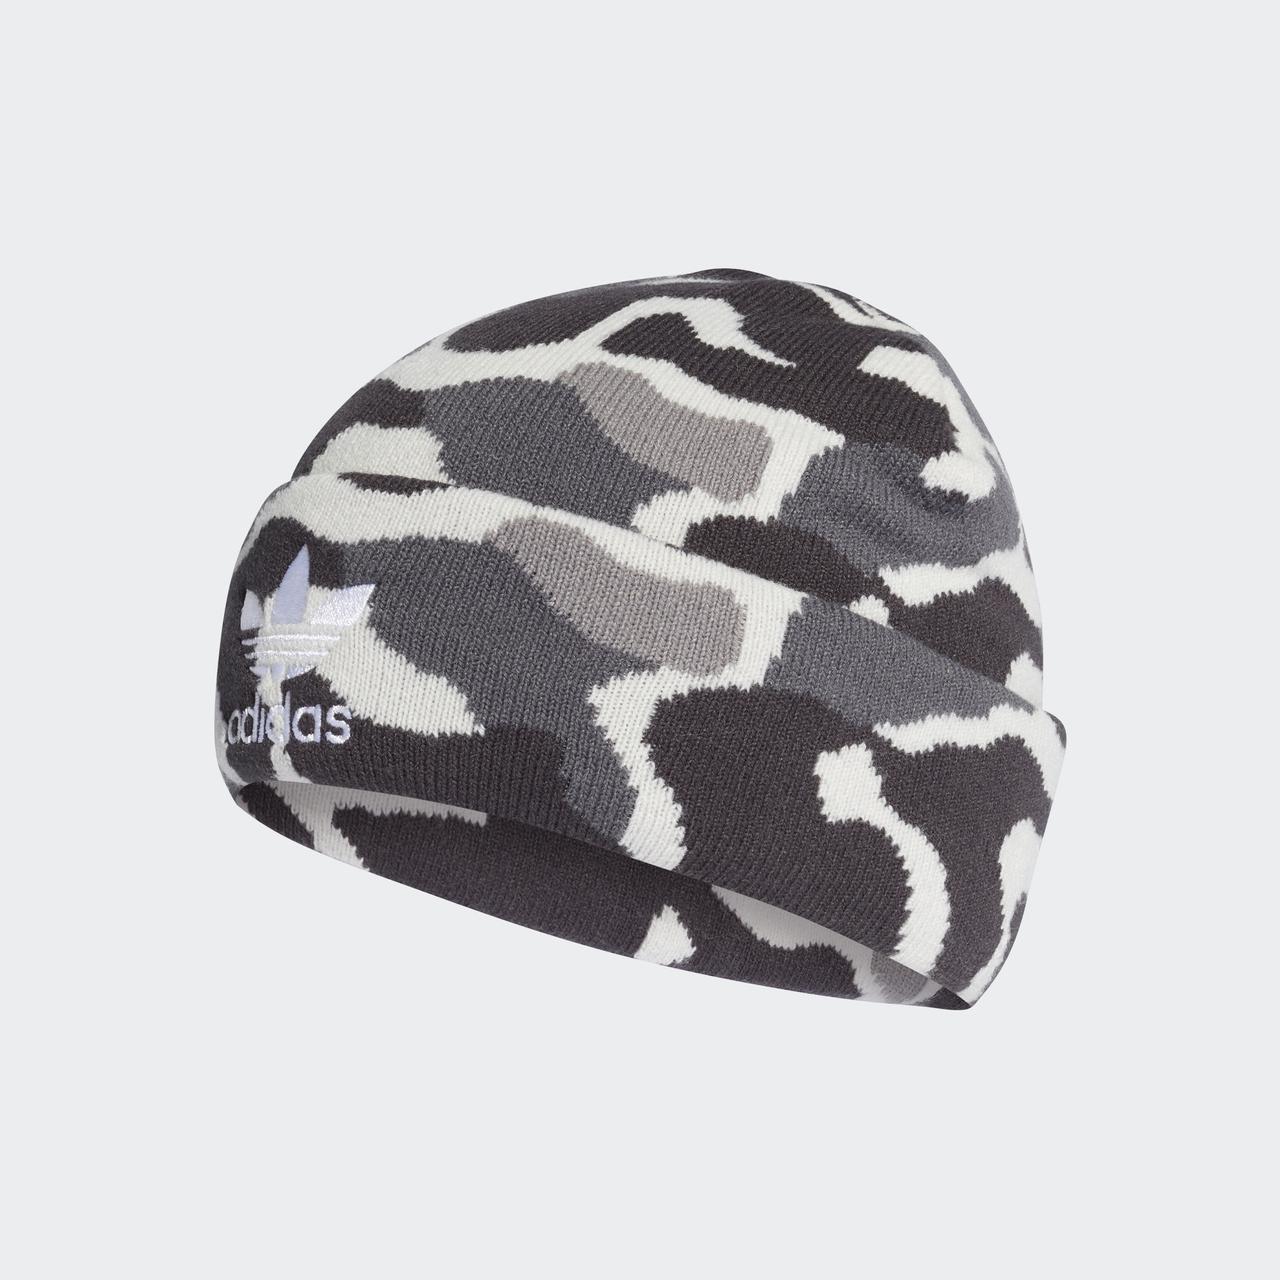 meet 78217 2a11d Шапка-бини adidas Camouflage DH1019 - 2018 2 - Интернет магазин Tip - все